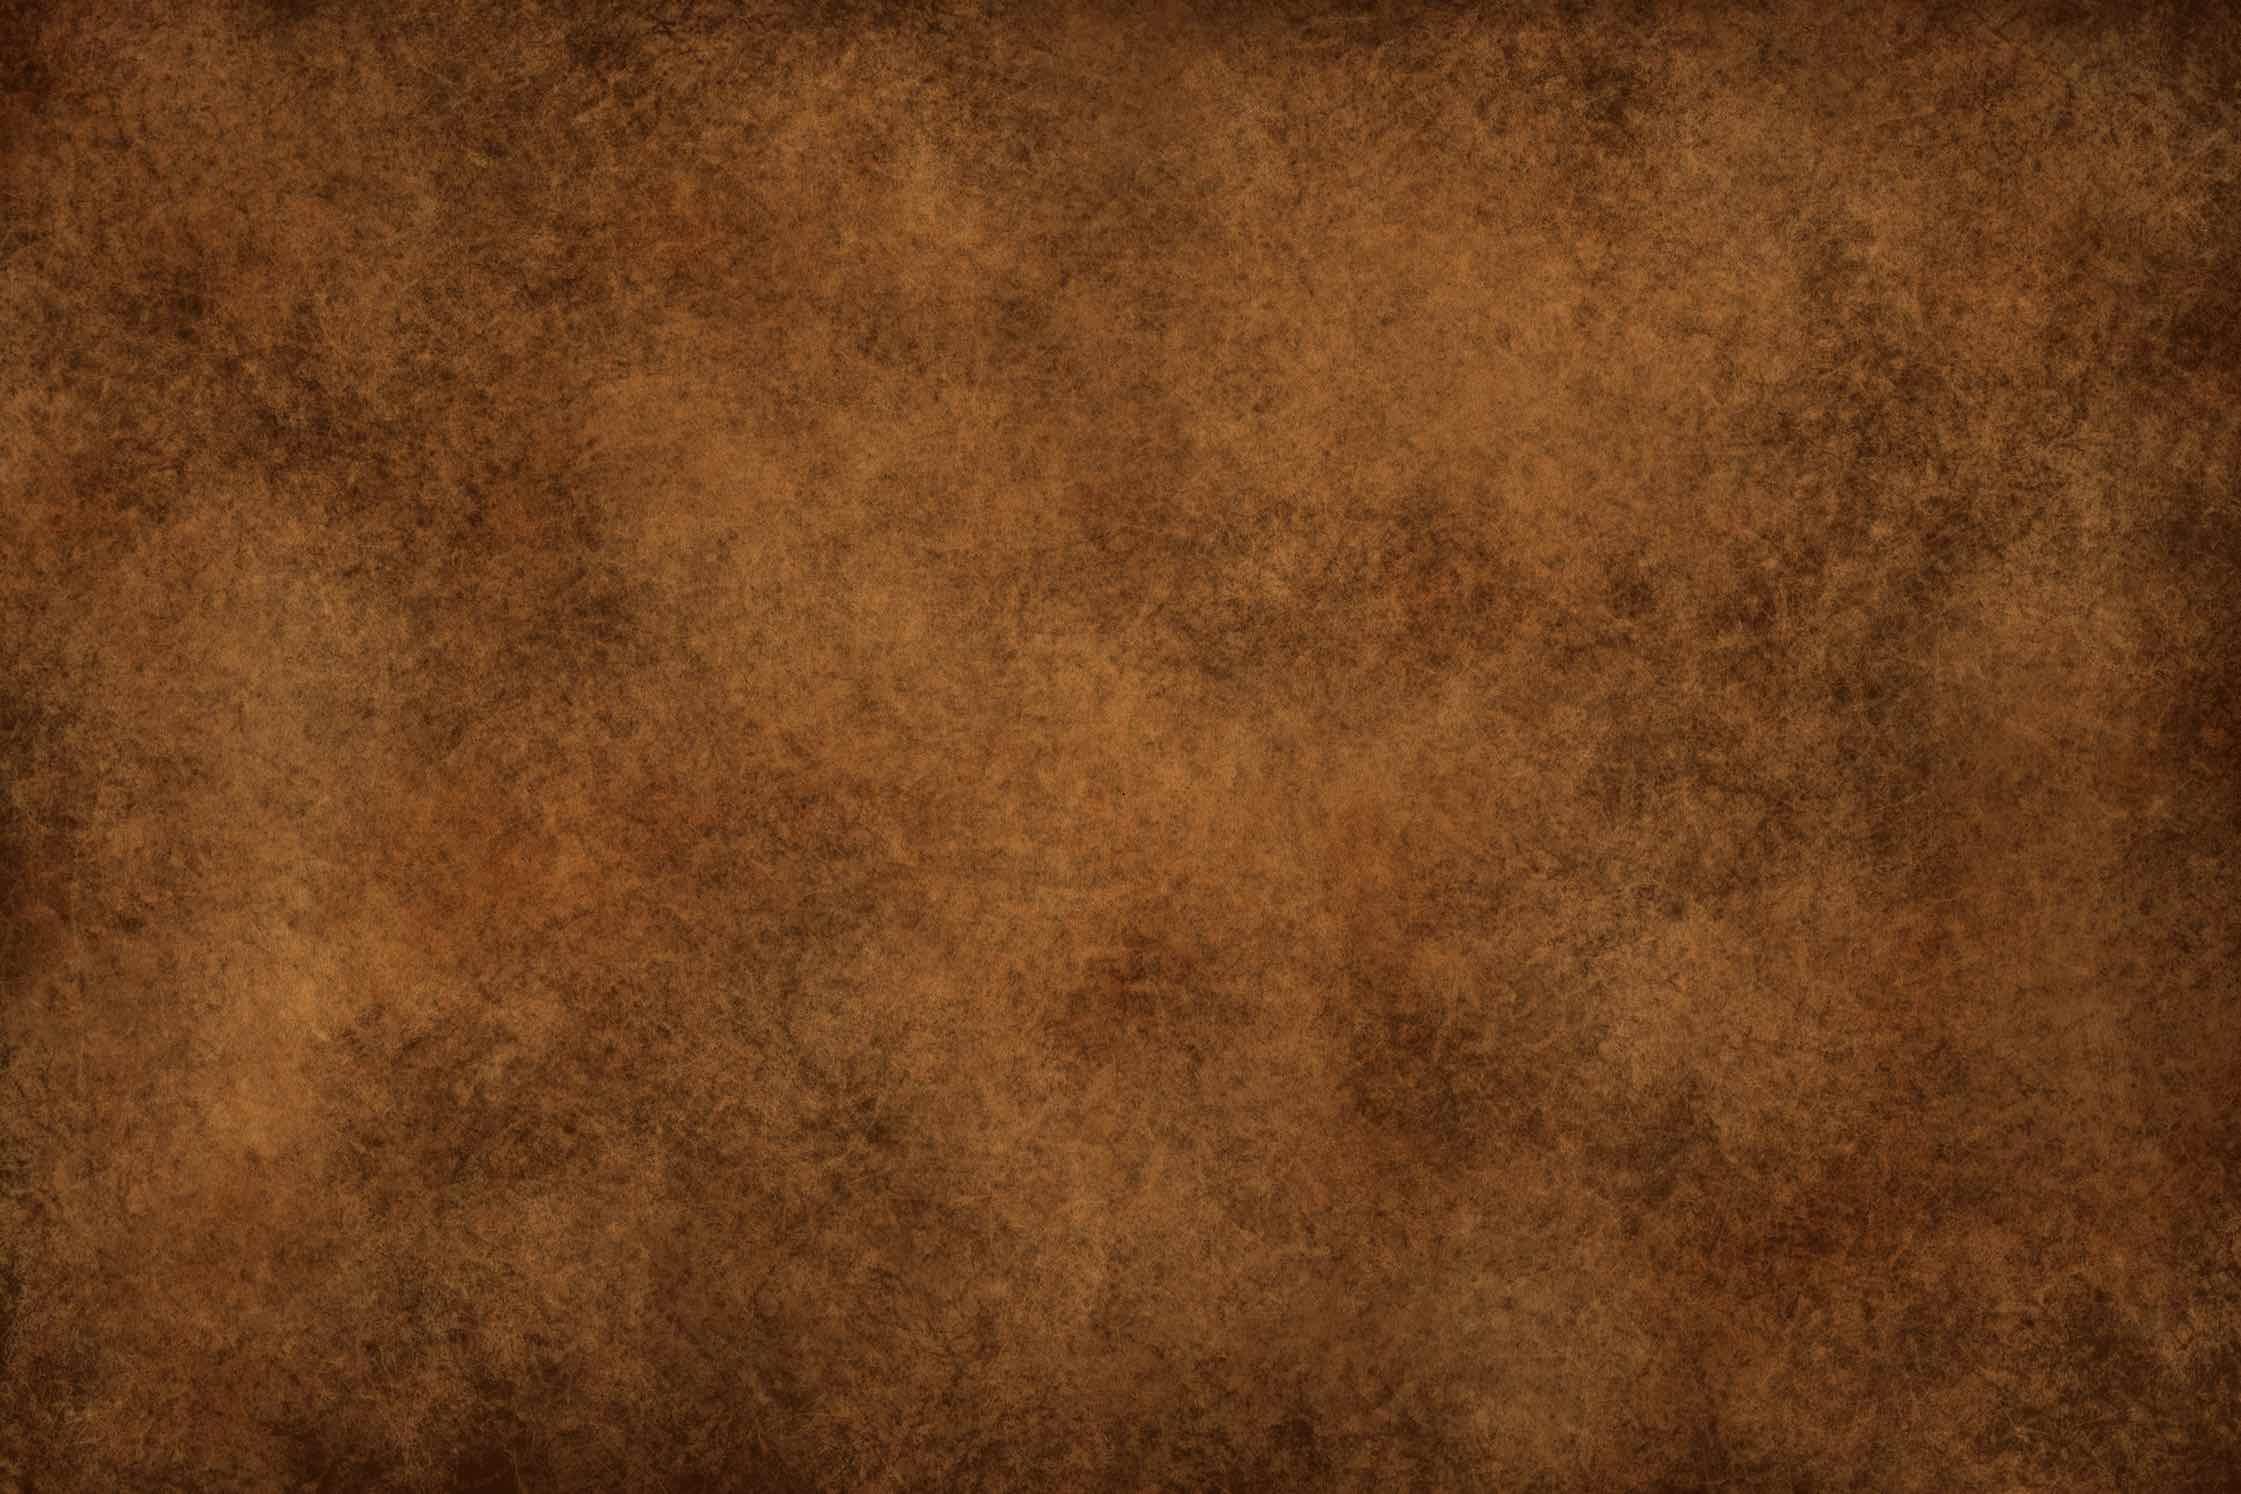 paper_texture301